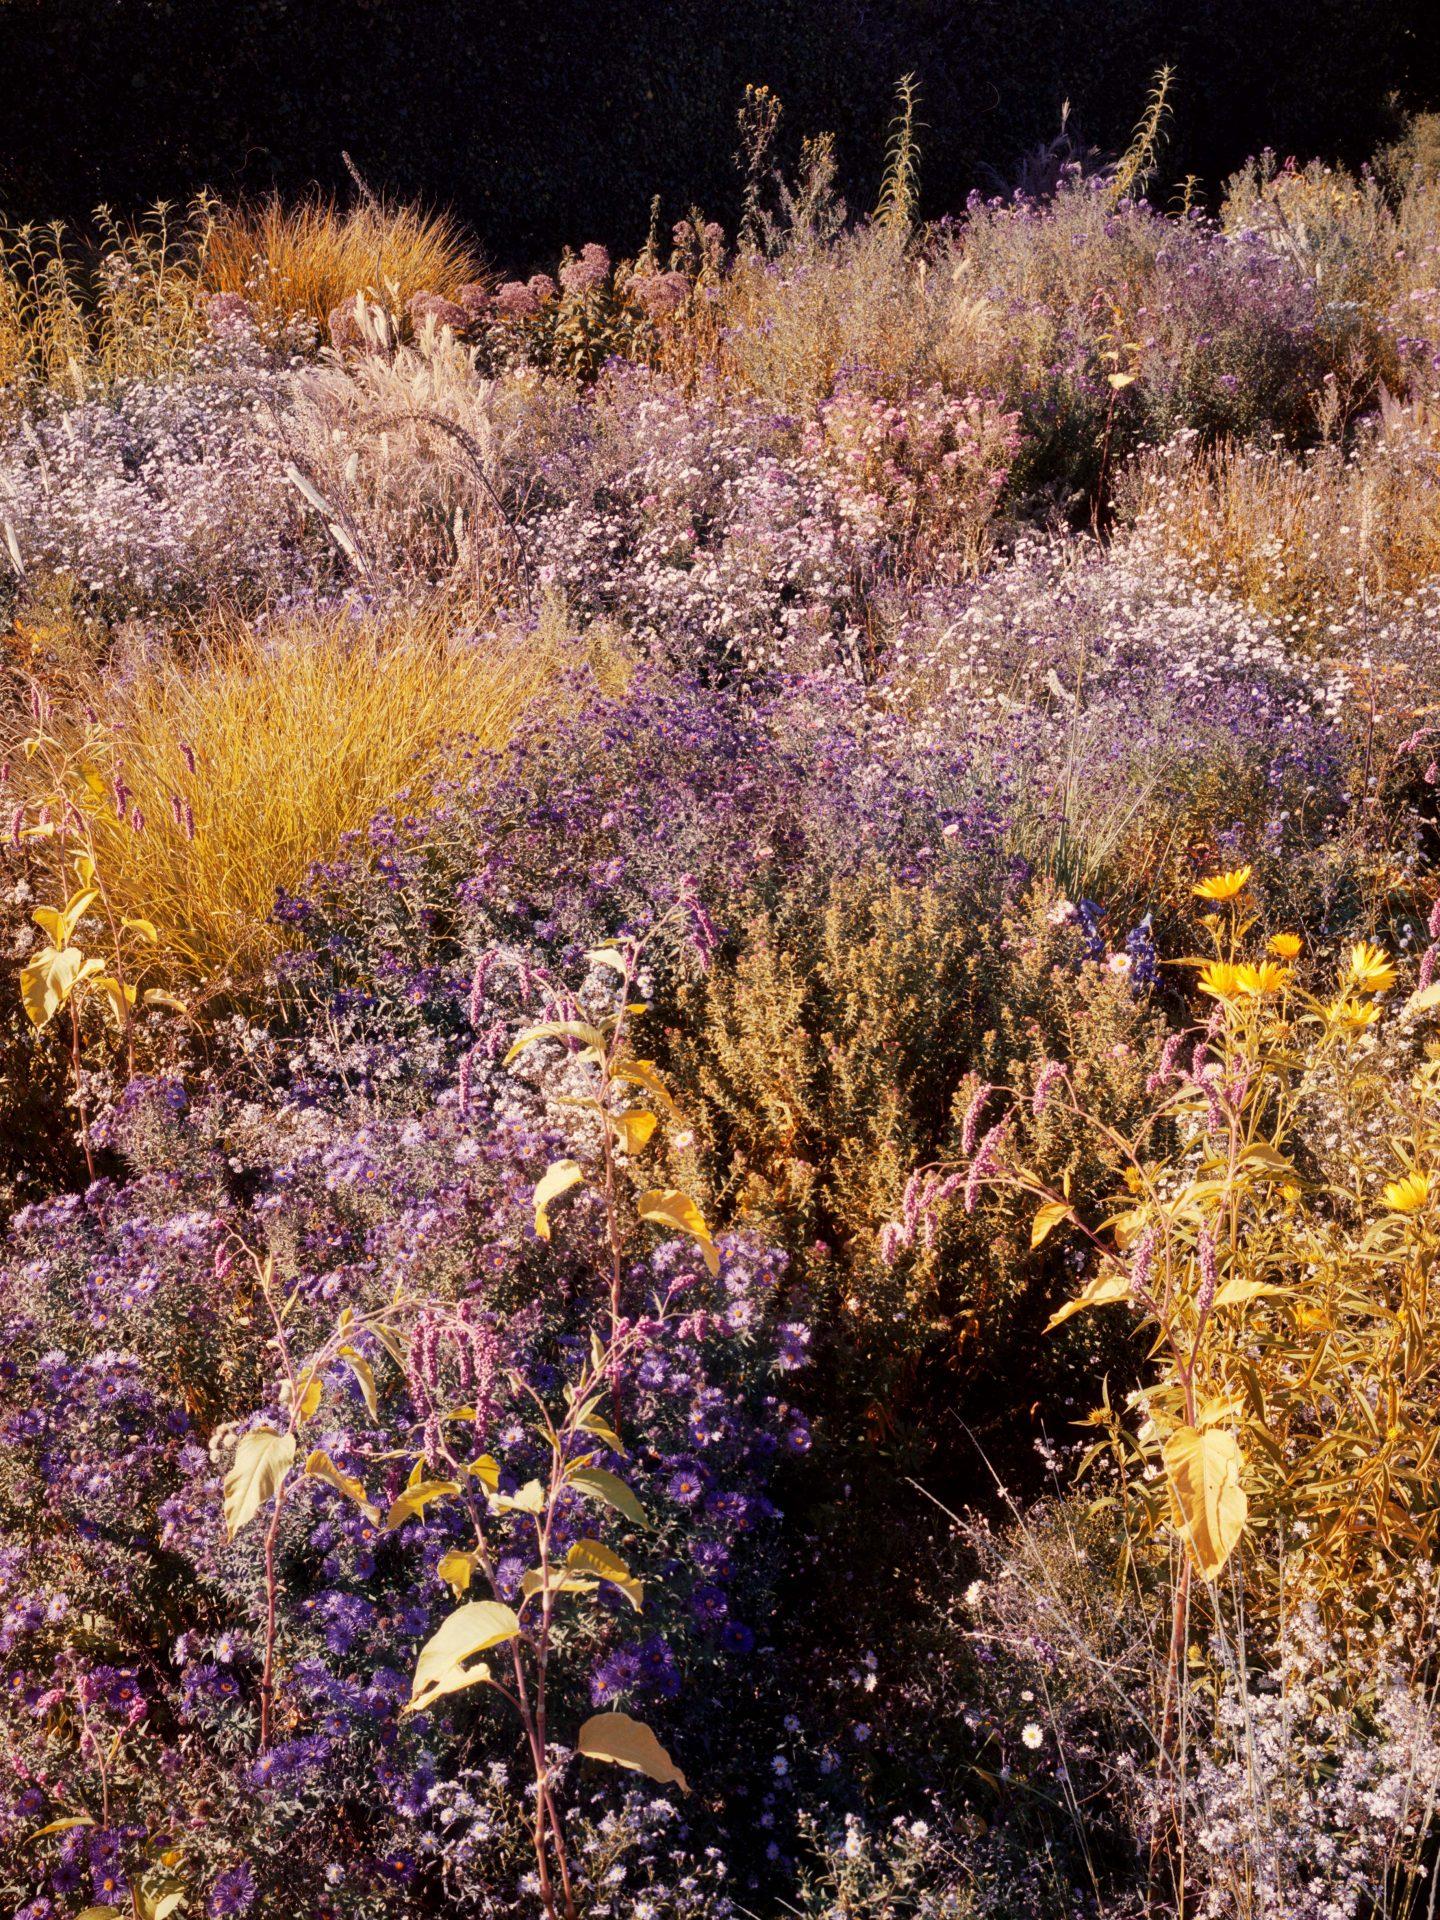 IGNANT-Photography-Jacques-Brun-Sunset-Garden-019